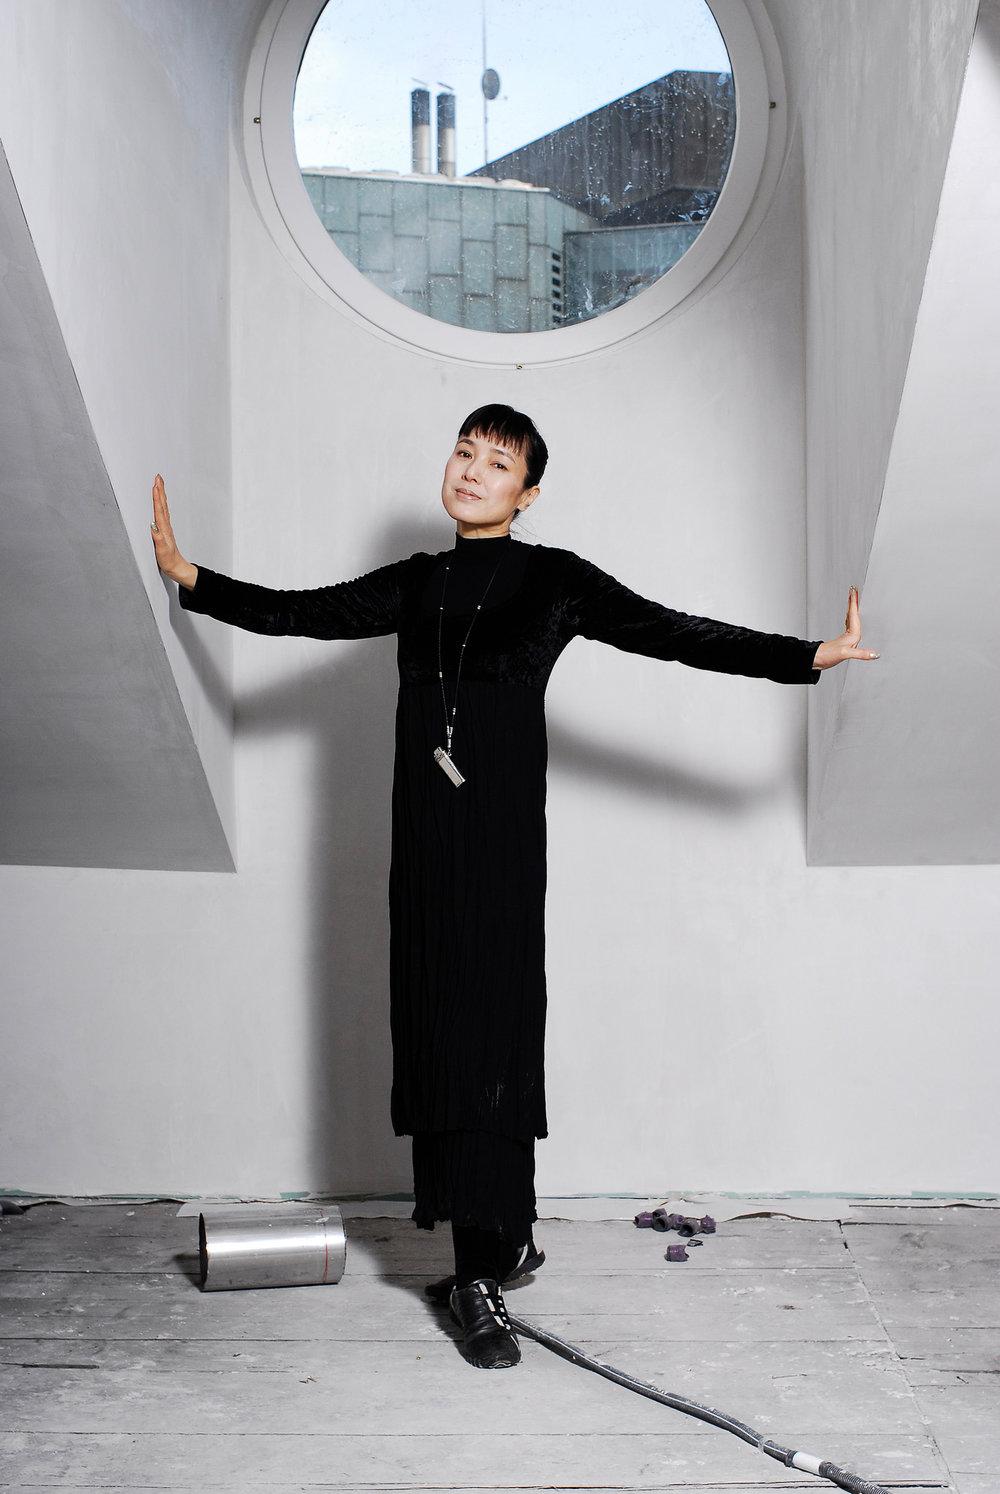 Kaori Momoi, réalisatrice et actrice. Mars 2007.